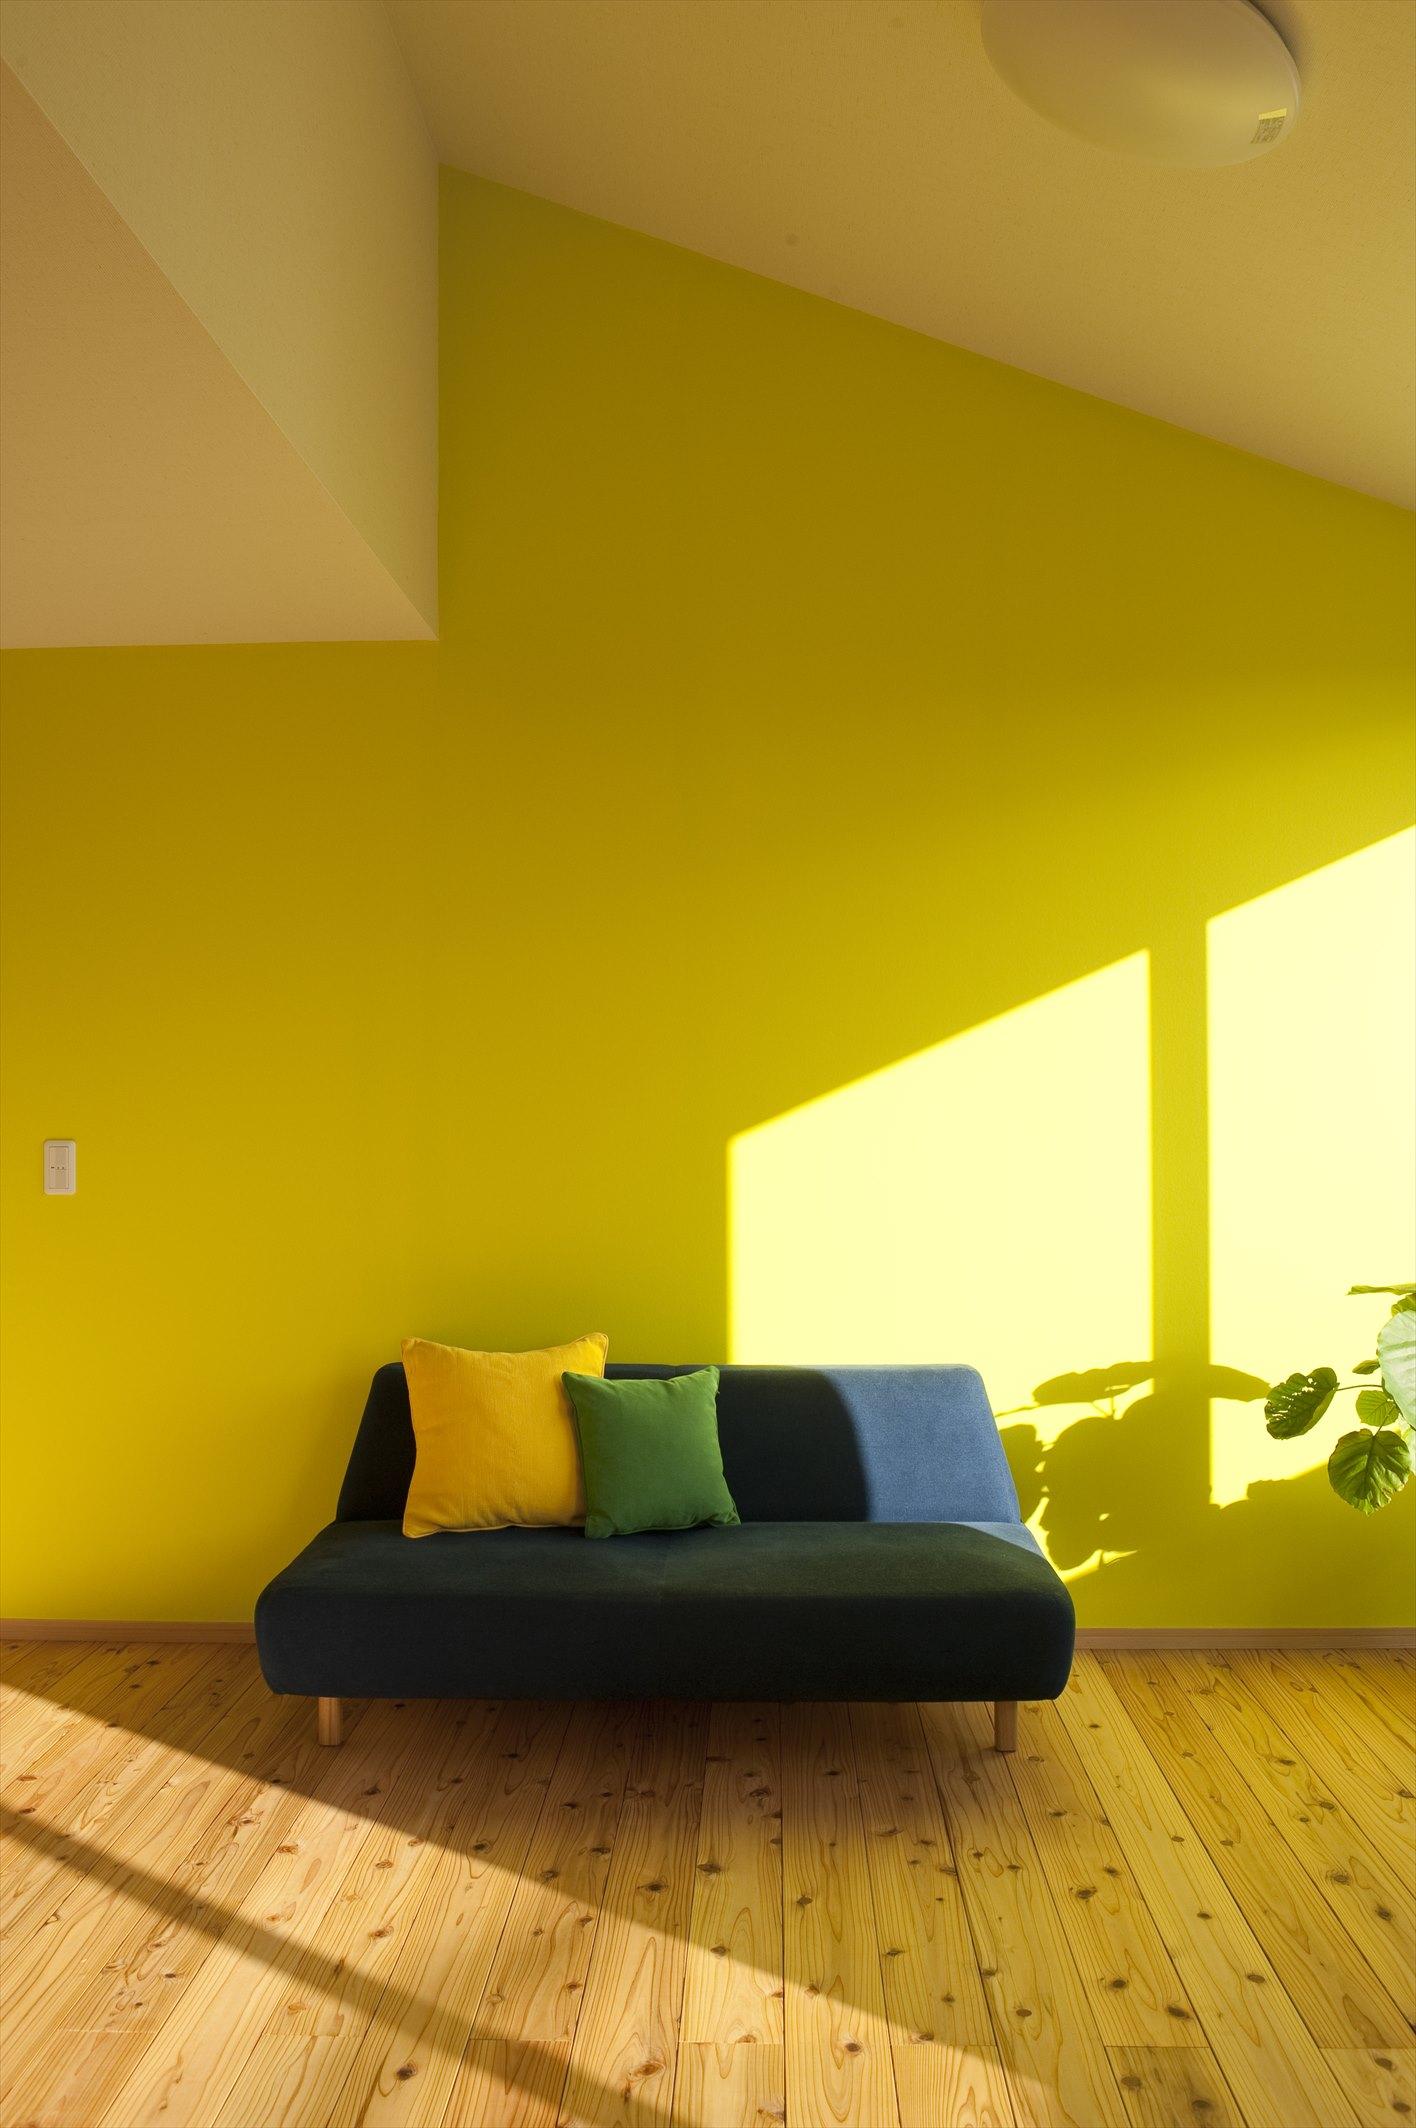 http://www.colorworks.co.jp/weblog/2014/09/22/Su_0253_R.jpg